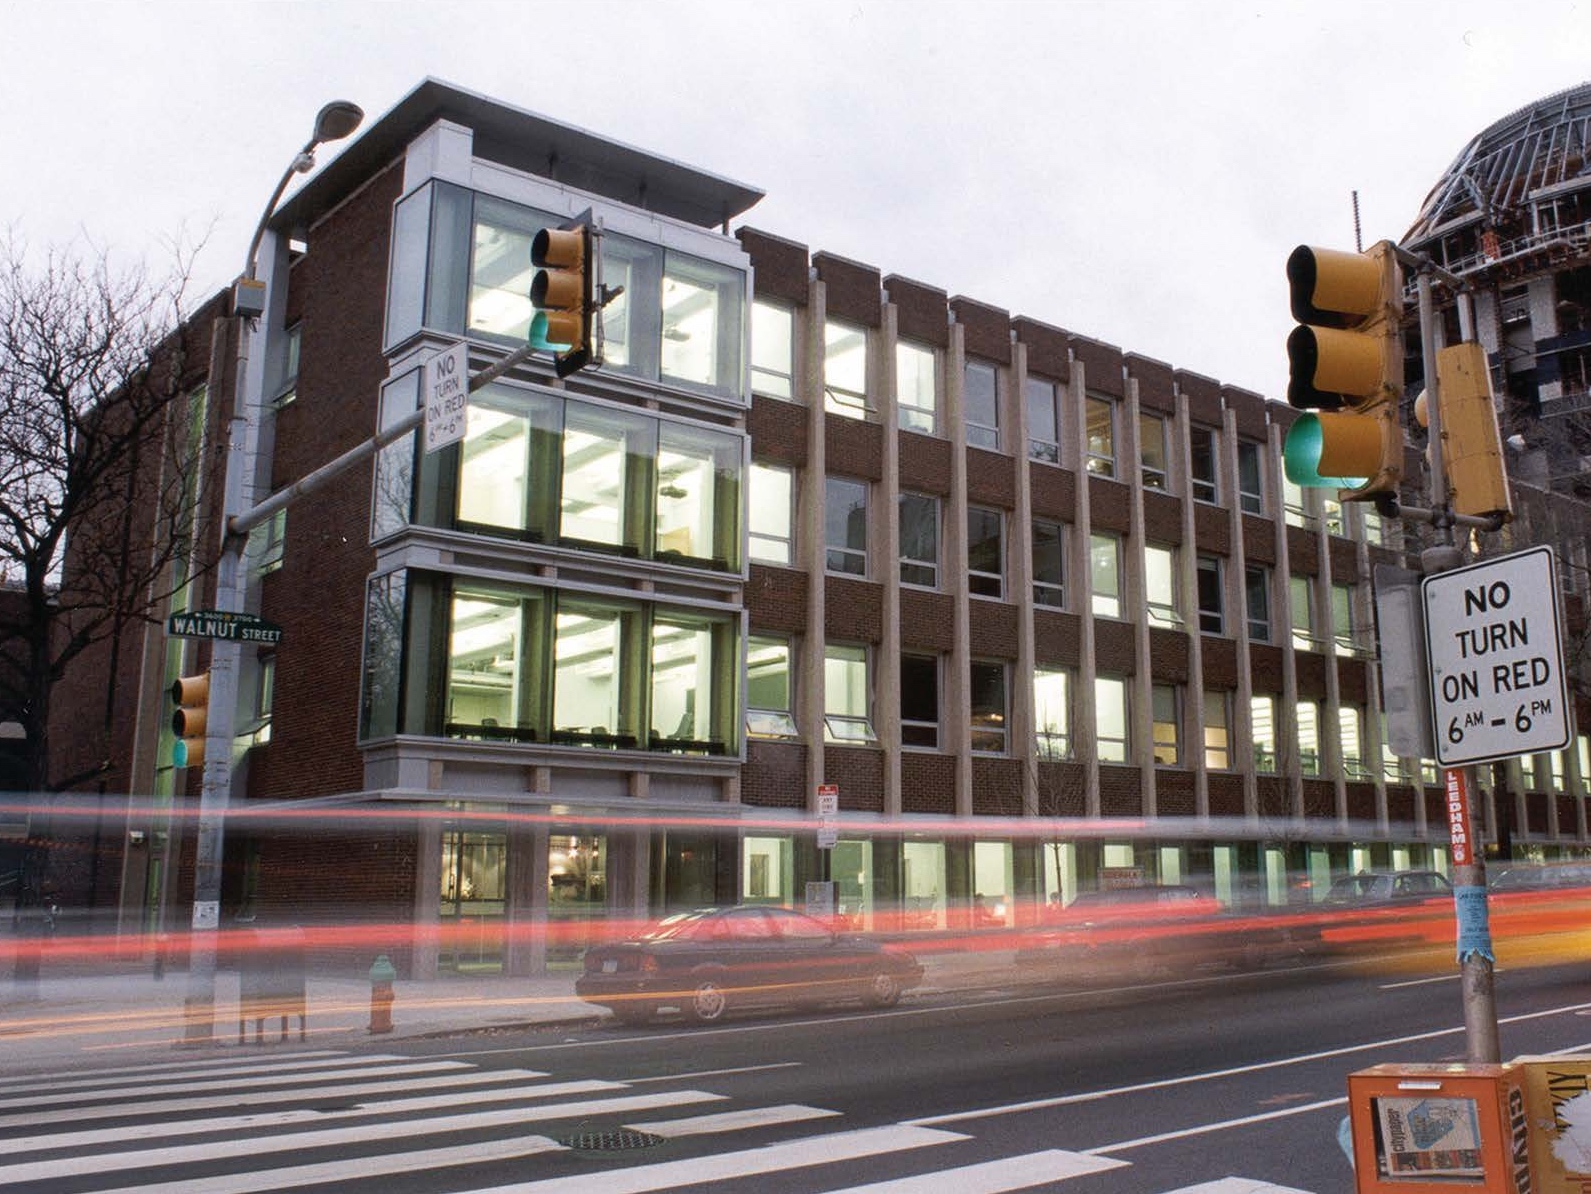 UPenn – Graduate School of Education